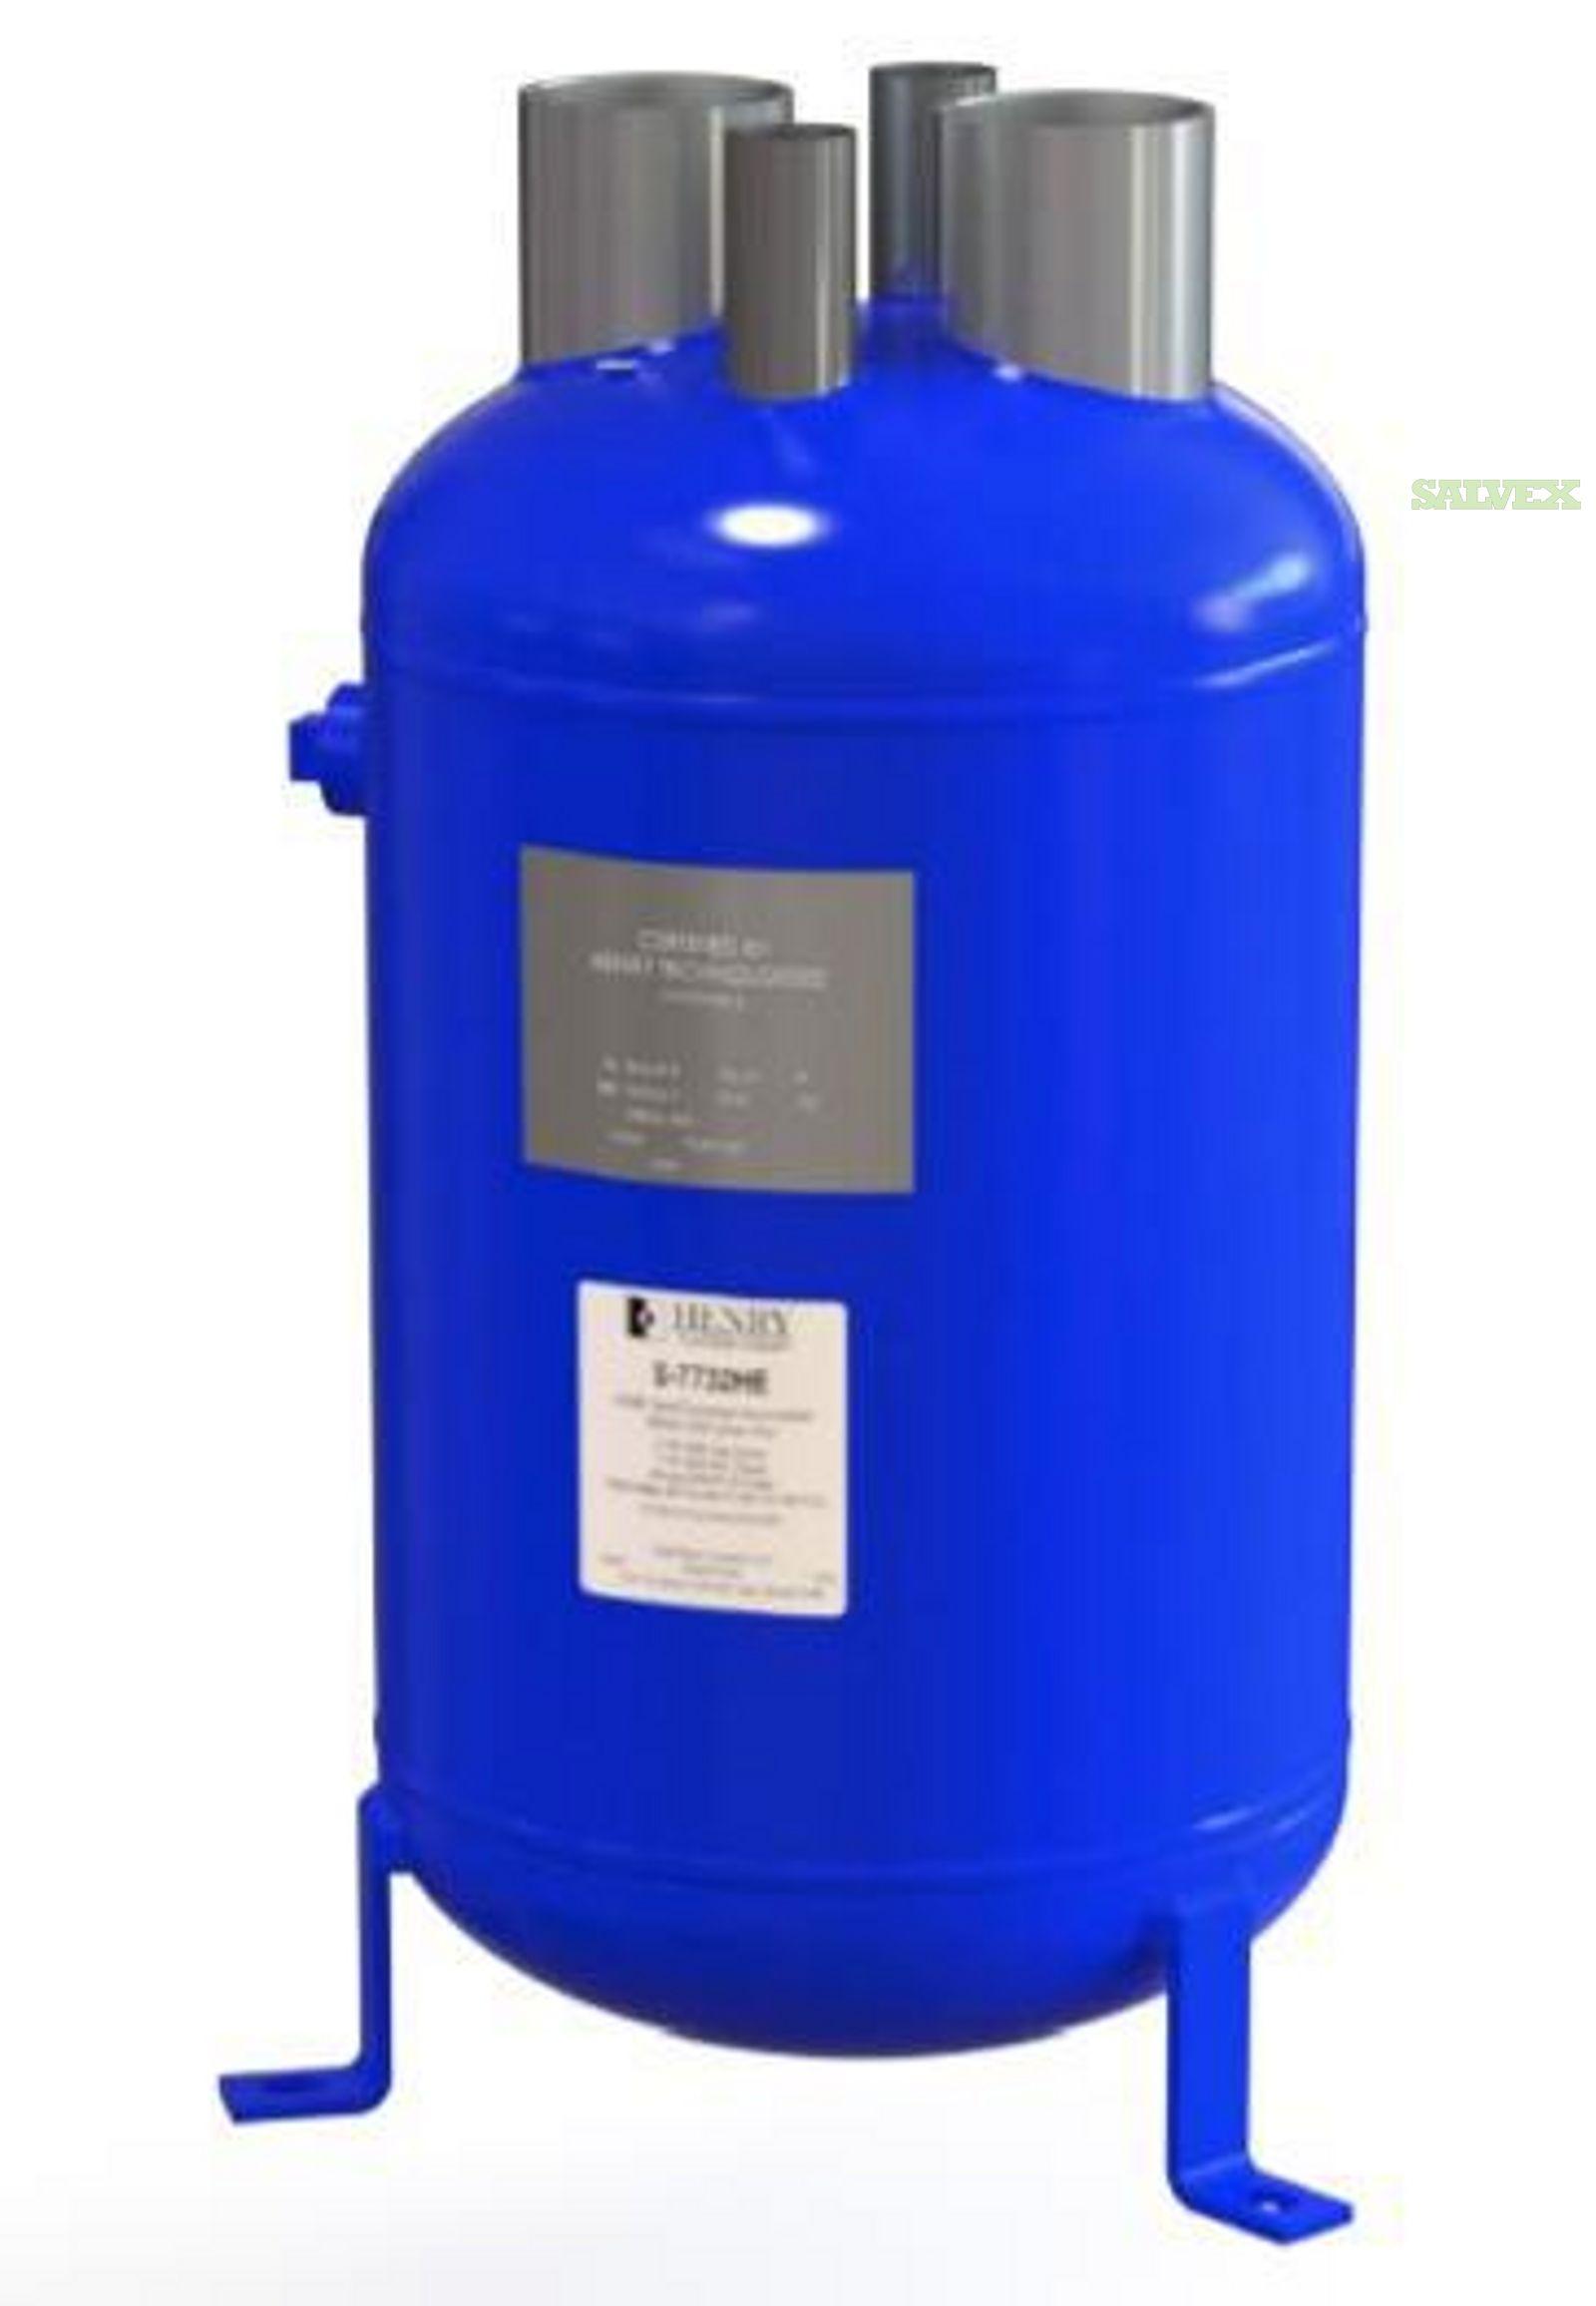 Henry Refrigeration Parts : Oil Separators, Receivers, Accumulator (27 Units) in Toronto, Ontario